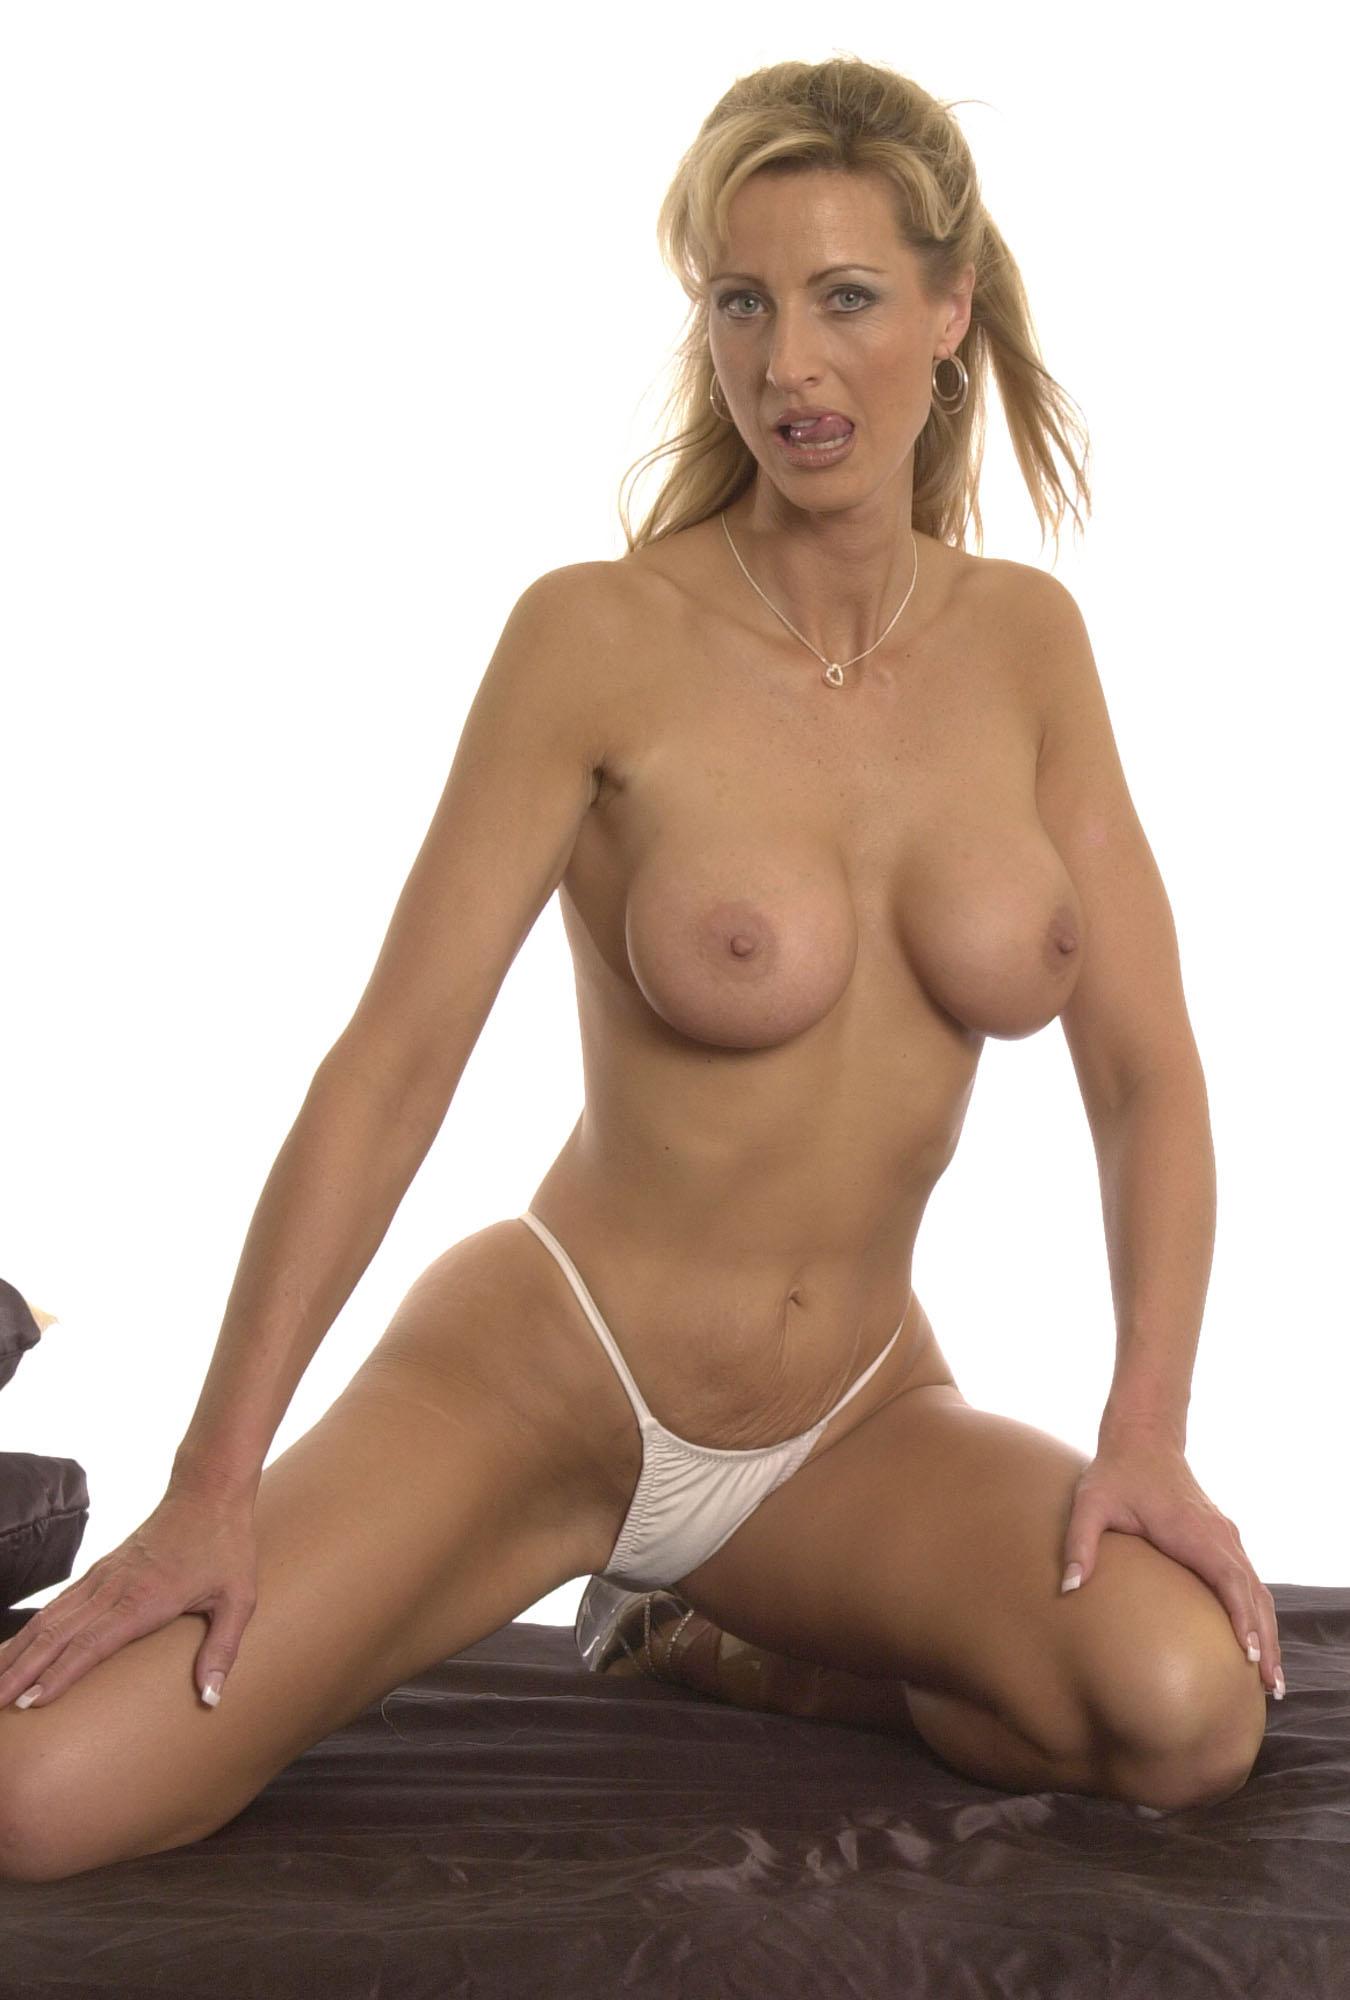 ... mom mature girl granny sex mature porn mature sexy mature fuck mature